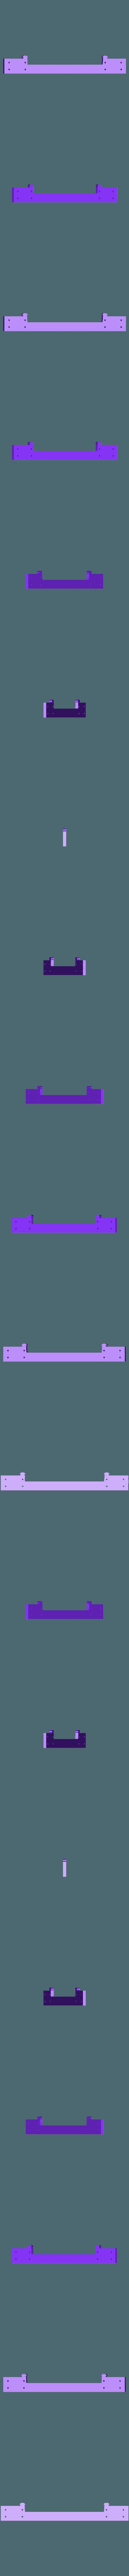 NCS_Makerfarm_Y_adapter_mount.stl Download free STL file NCS P3-v Steel to Makerfarm 12 inch bed carriage adapter kit • 3D printing design, trentjw